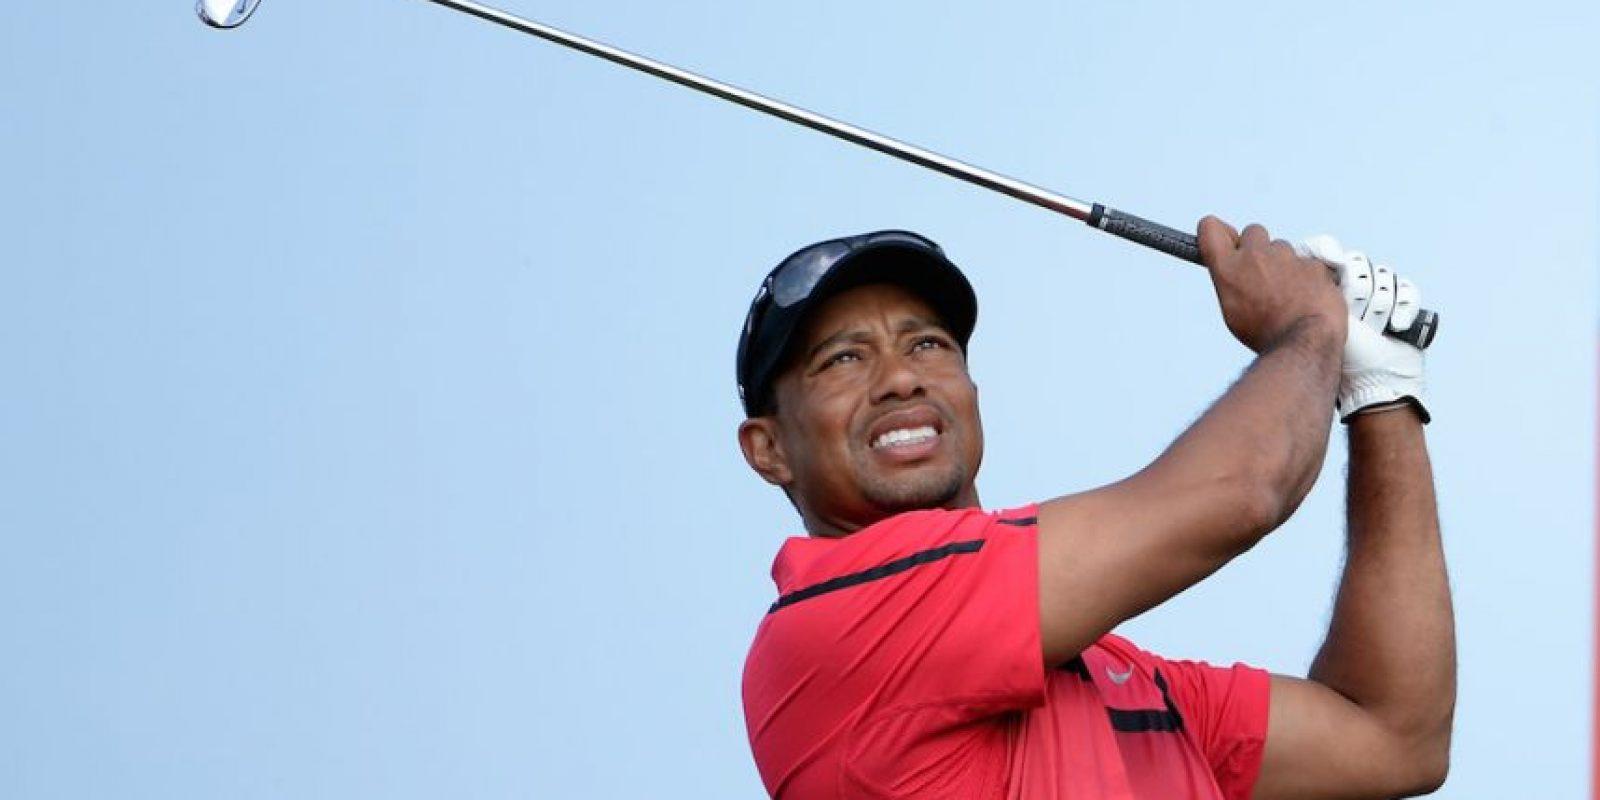 Tiger Woods, golfista estadounidense. Foto:Getty Images